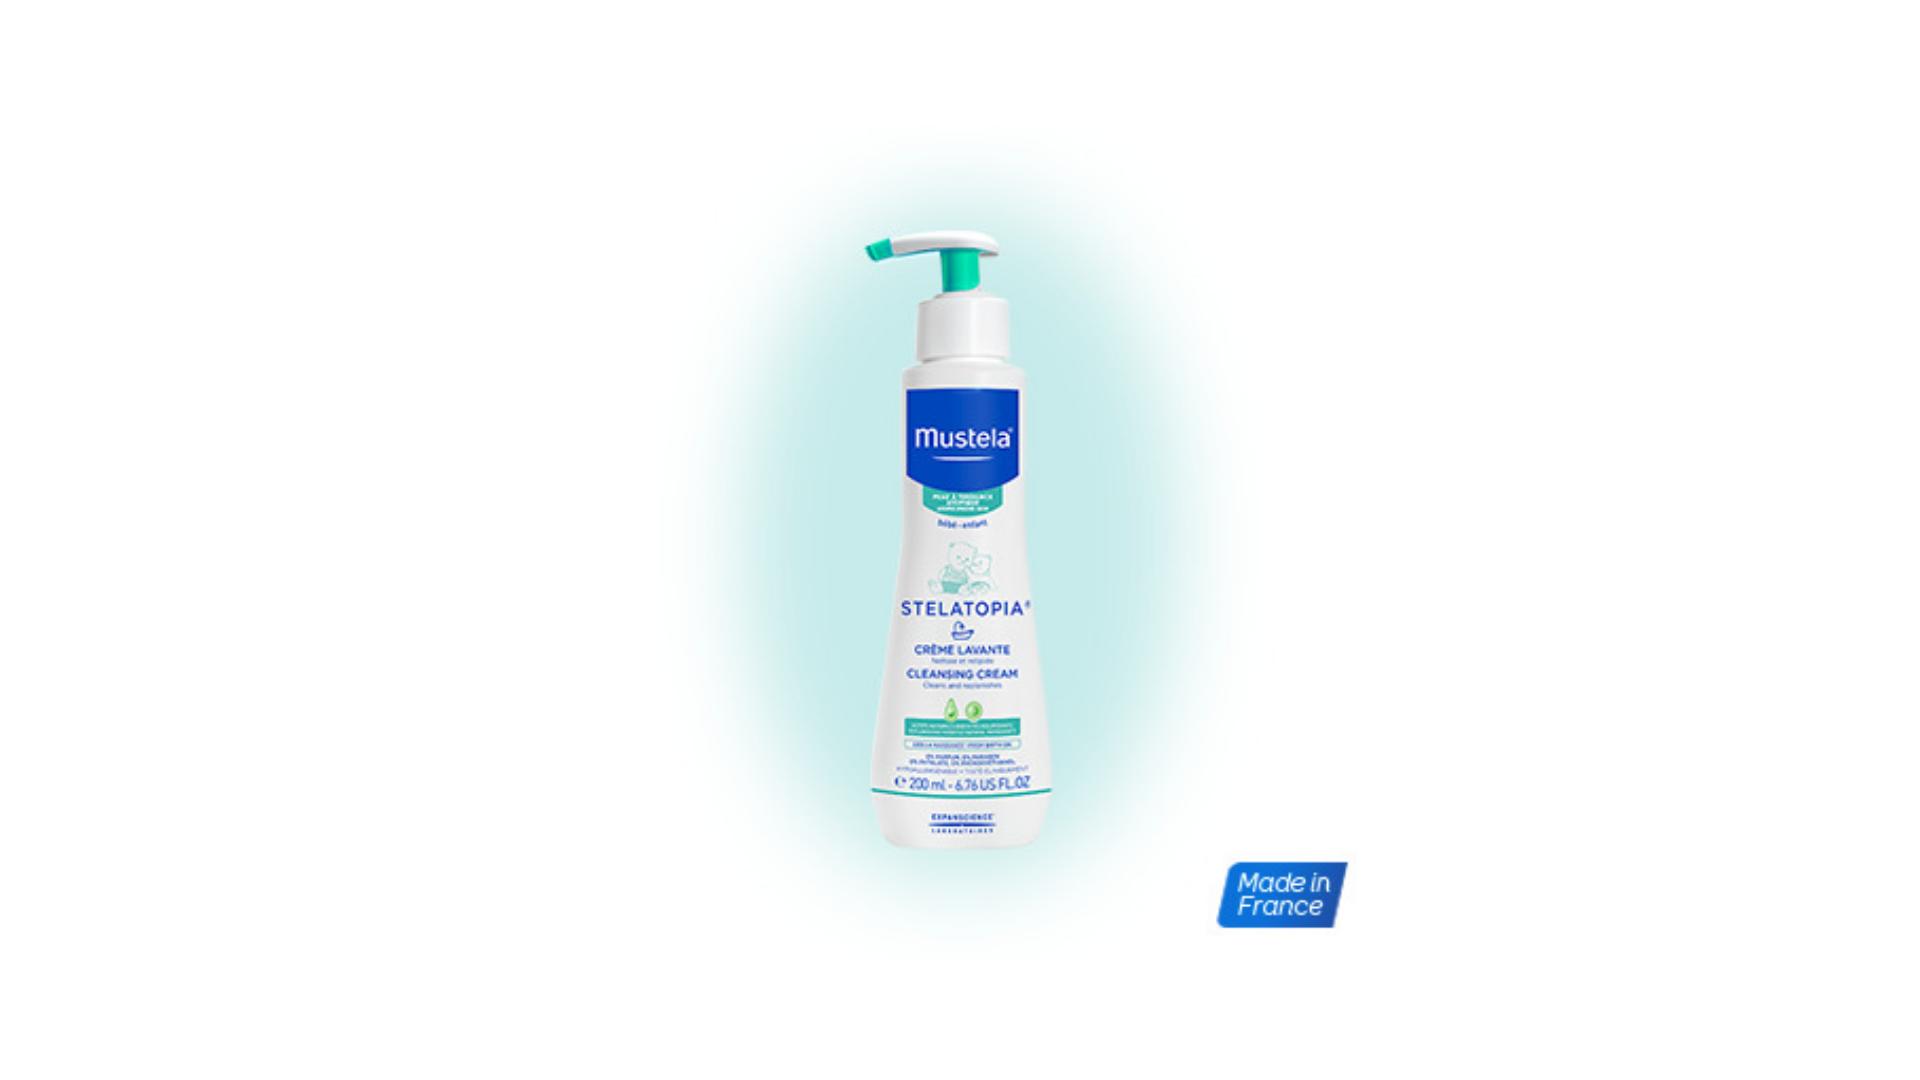 Mustela | STELATOPIA Creme Lavante 500ml